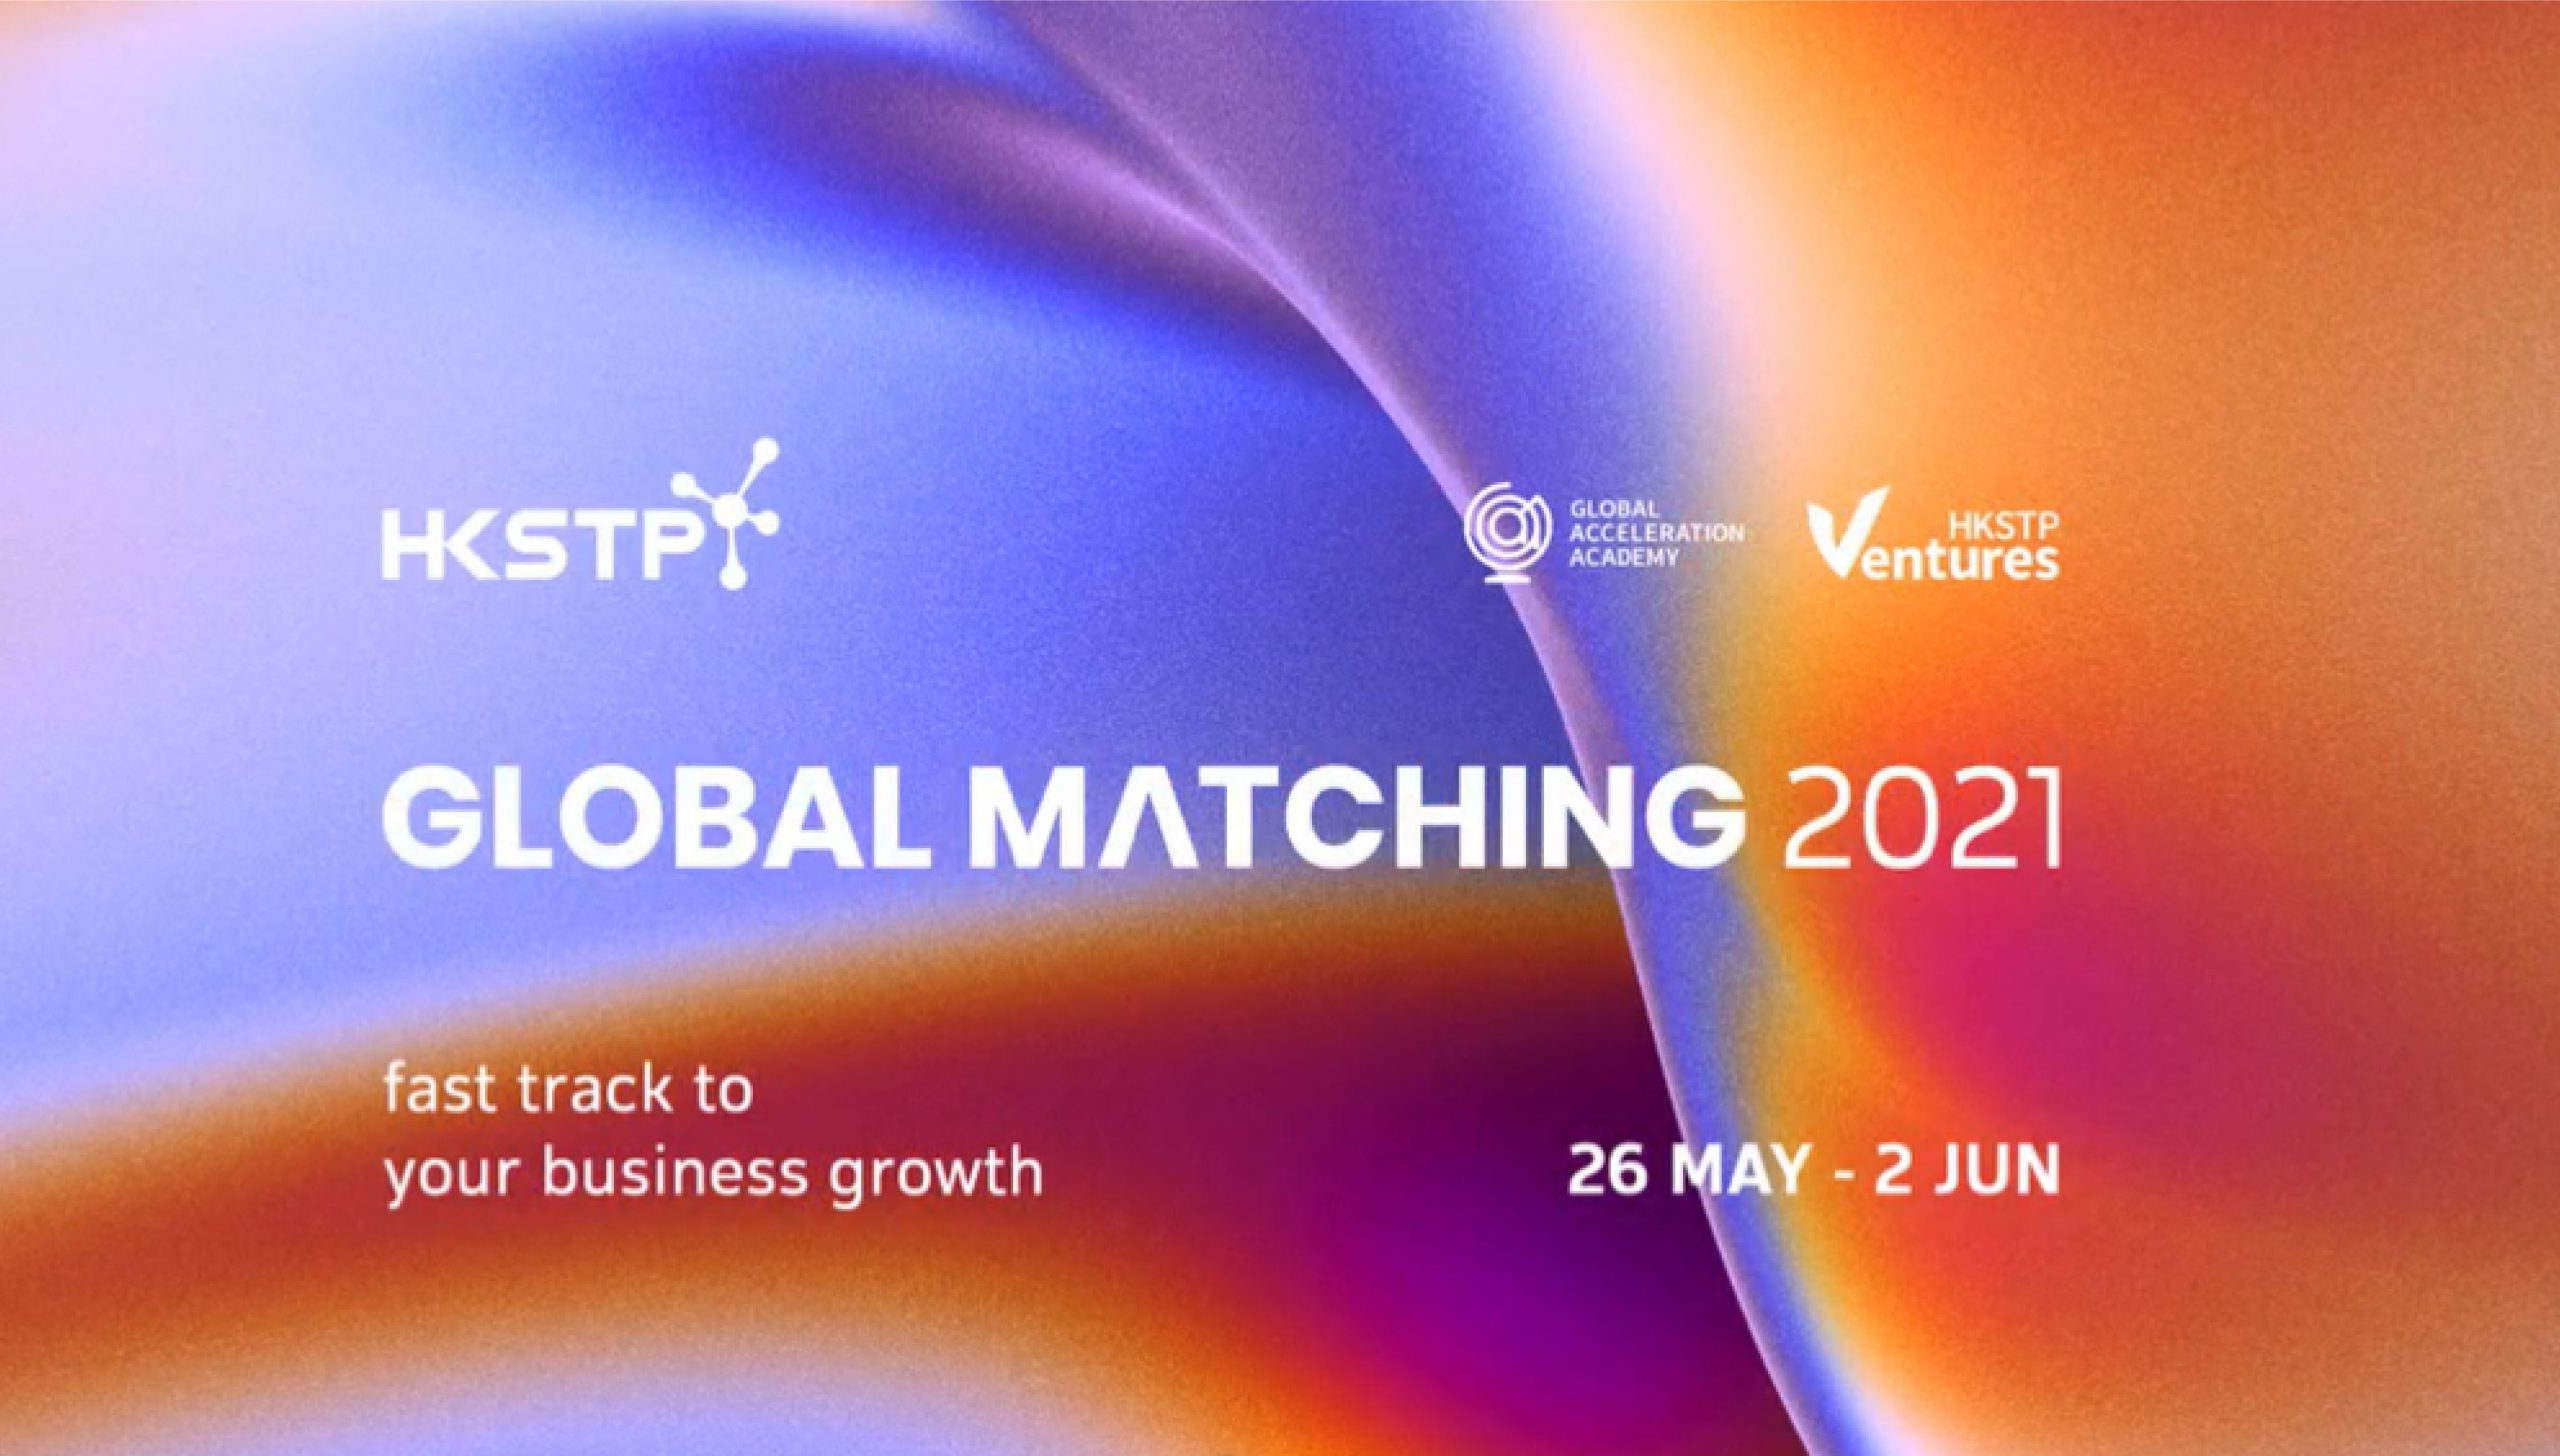 Global-matching-2021